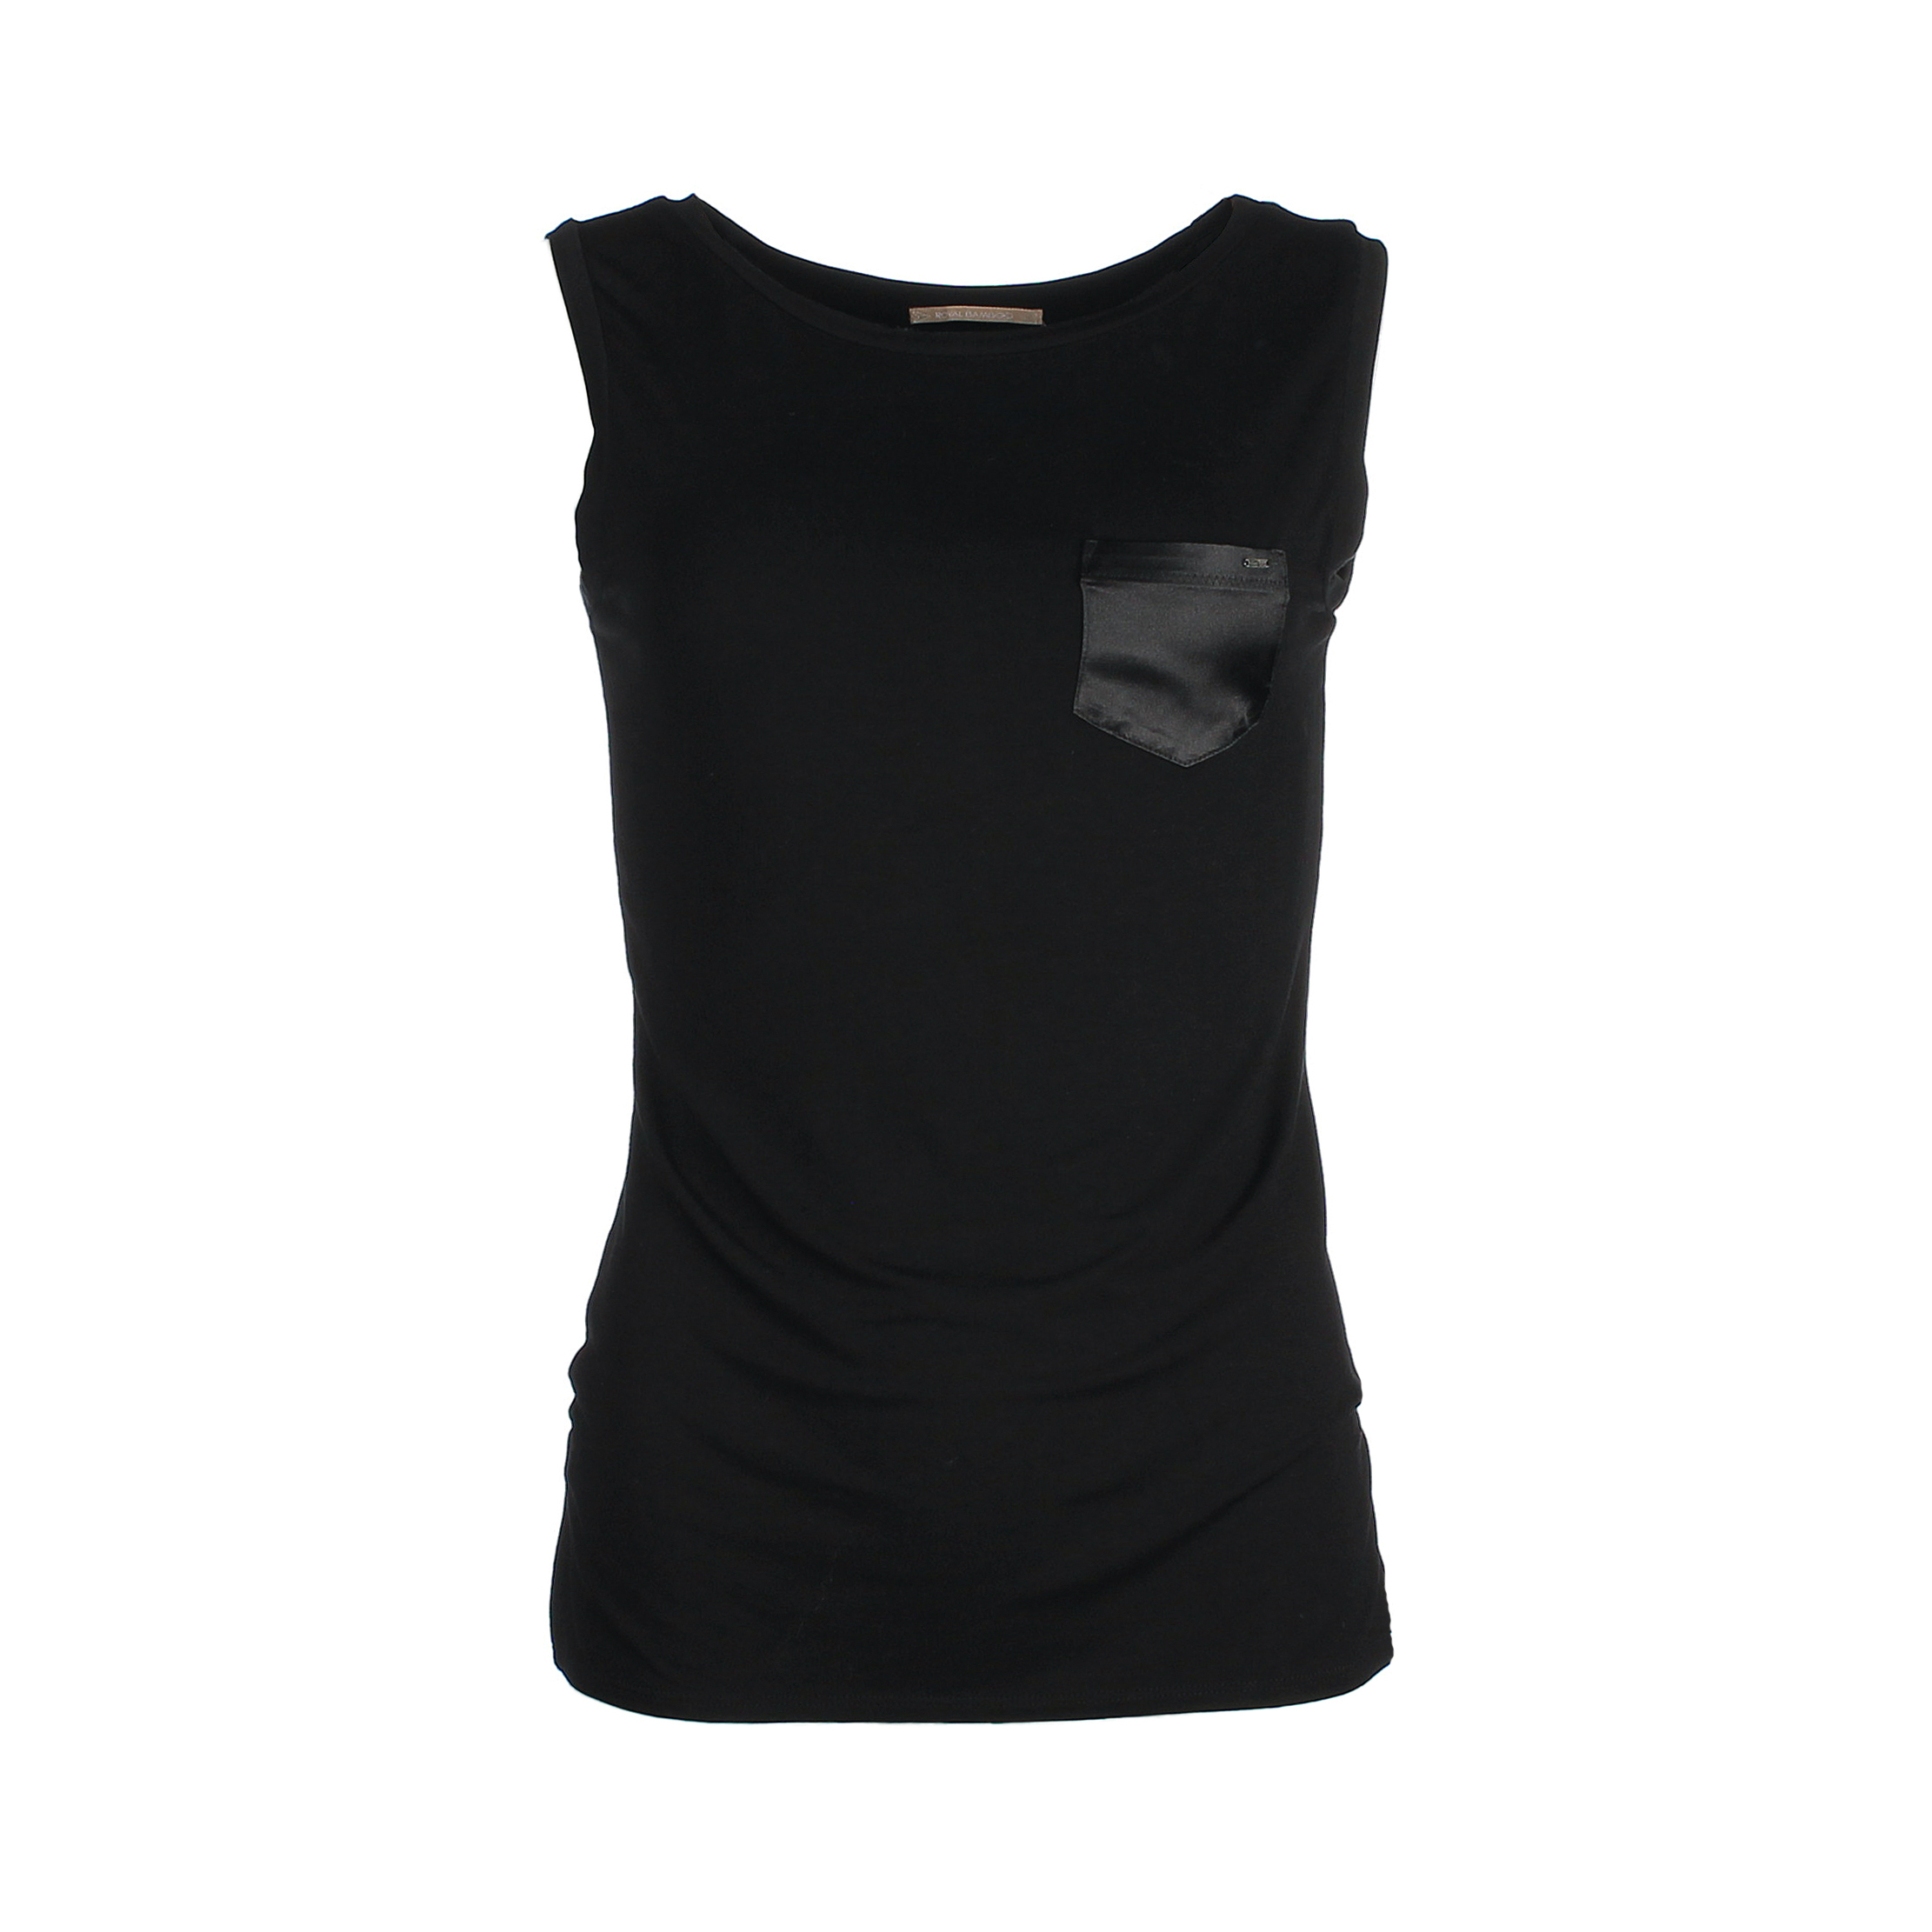 Sleeveless chest-pocket top bamboo - black - Mouwloze top borstzakje - zwart